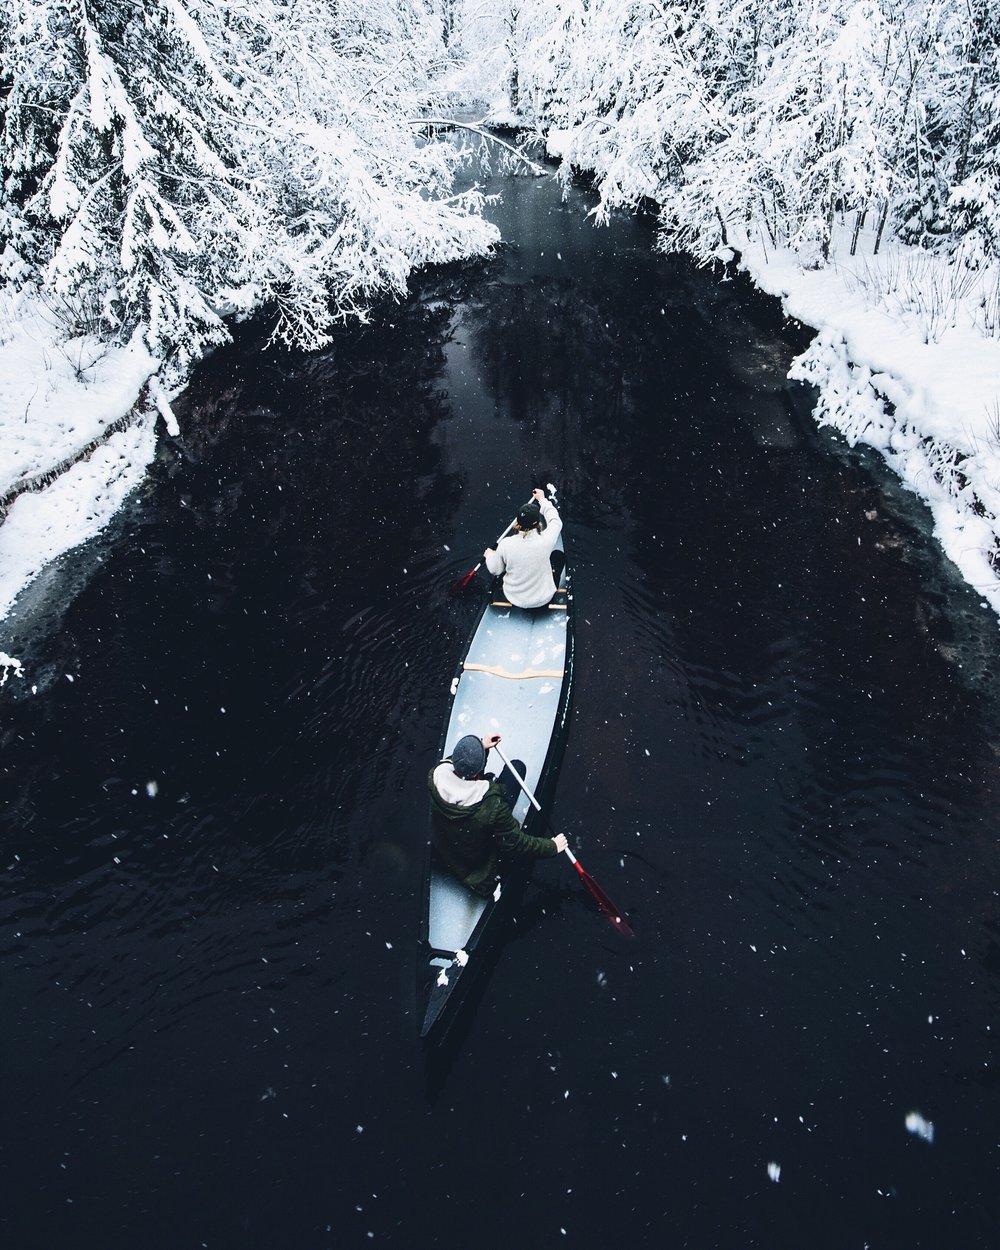 henrik.koskelo.winter.canoe.river.jpeg